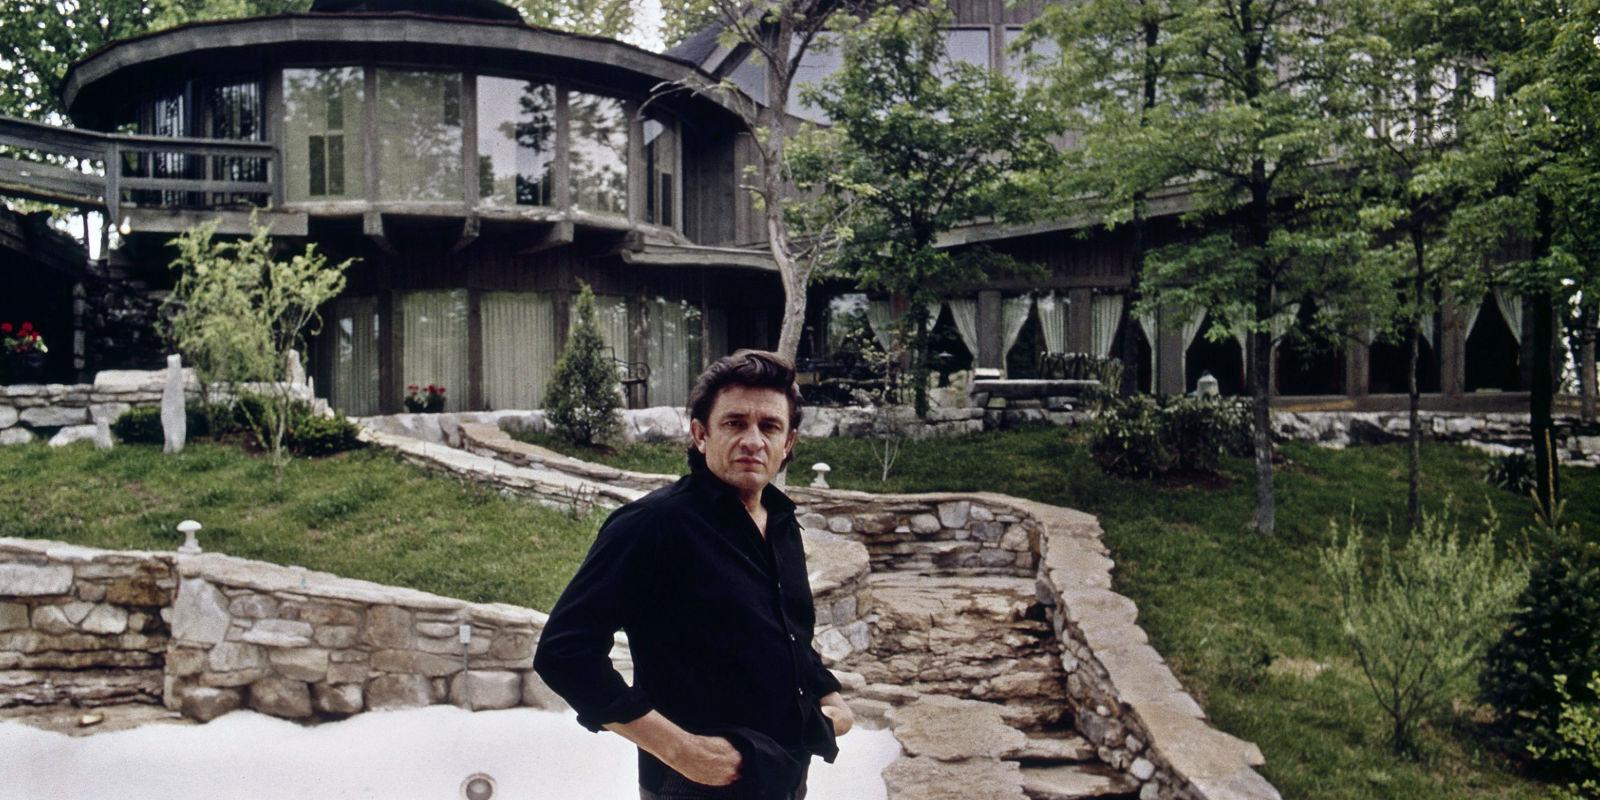 Johnny Cash Home for Sale  Johnny Cash and June Carter